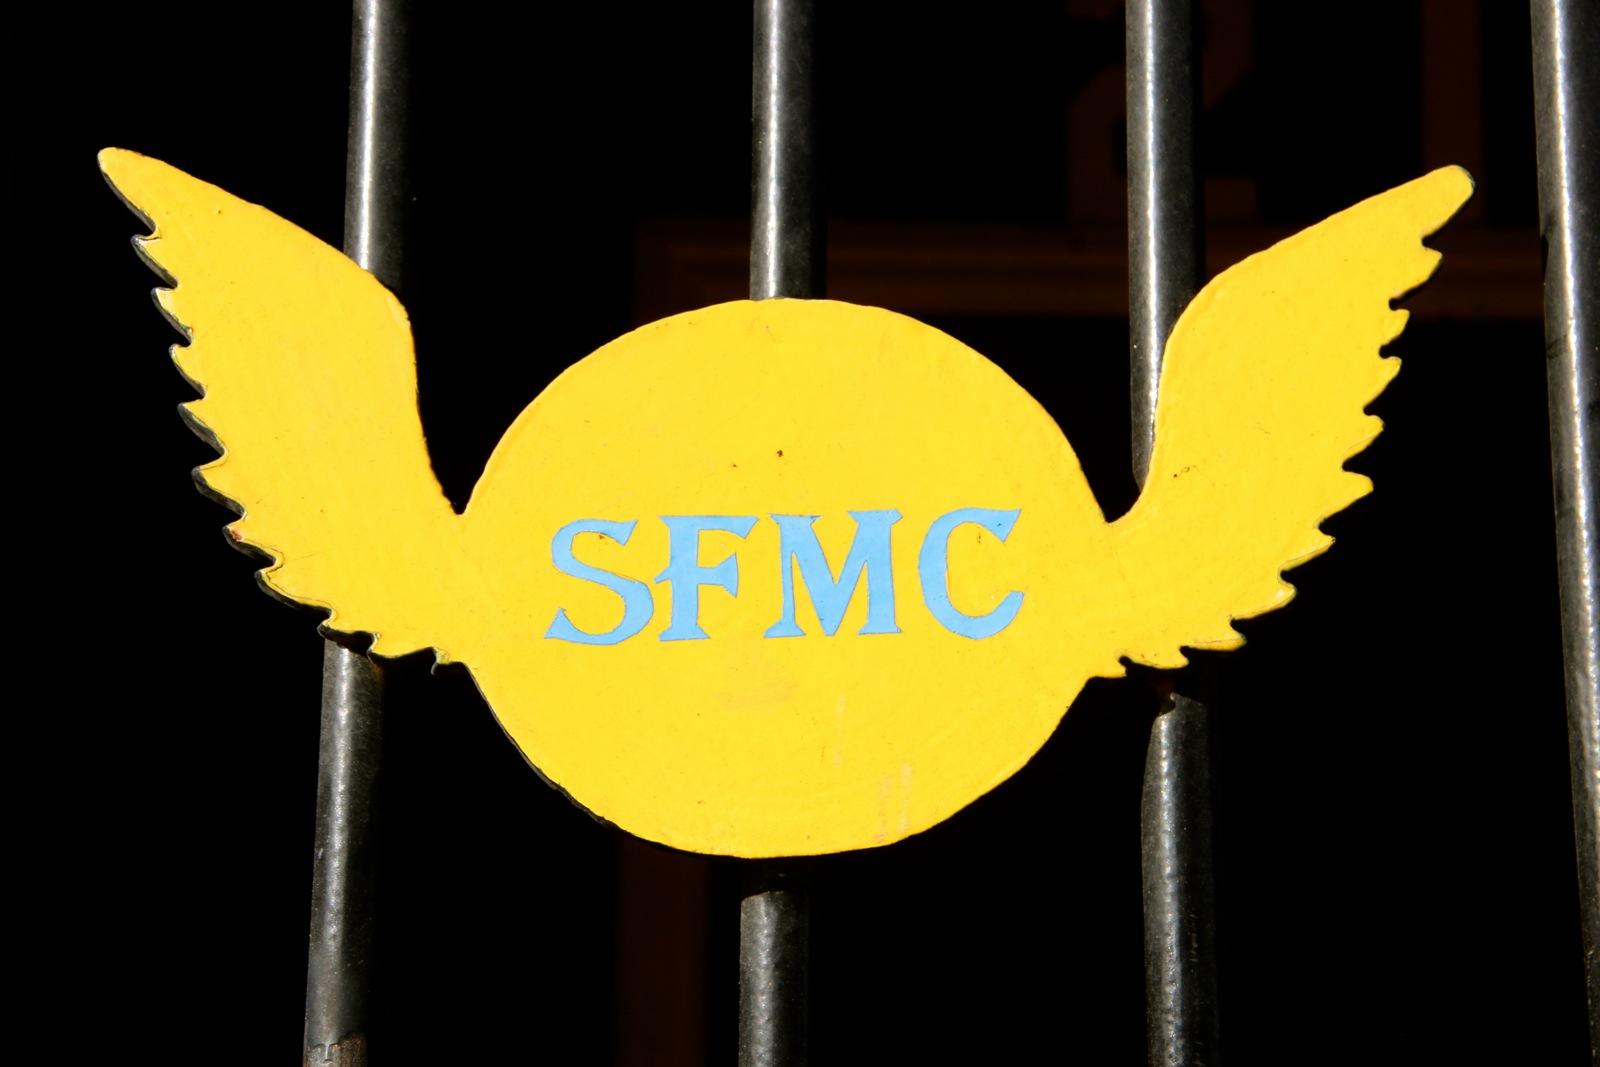 SFMC sign